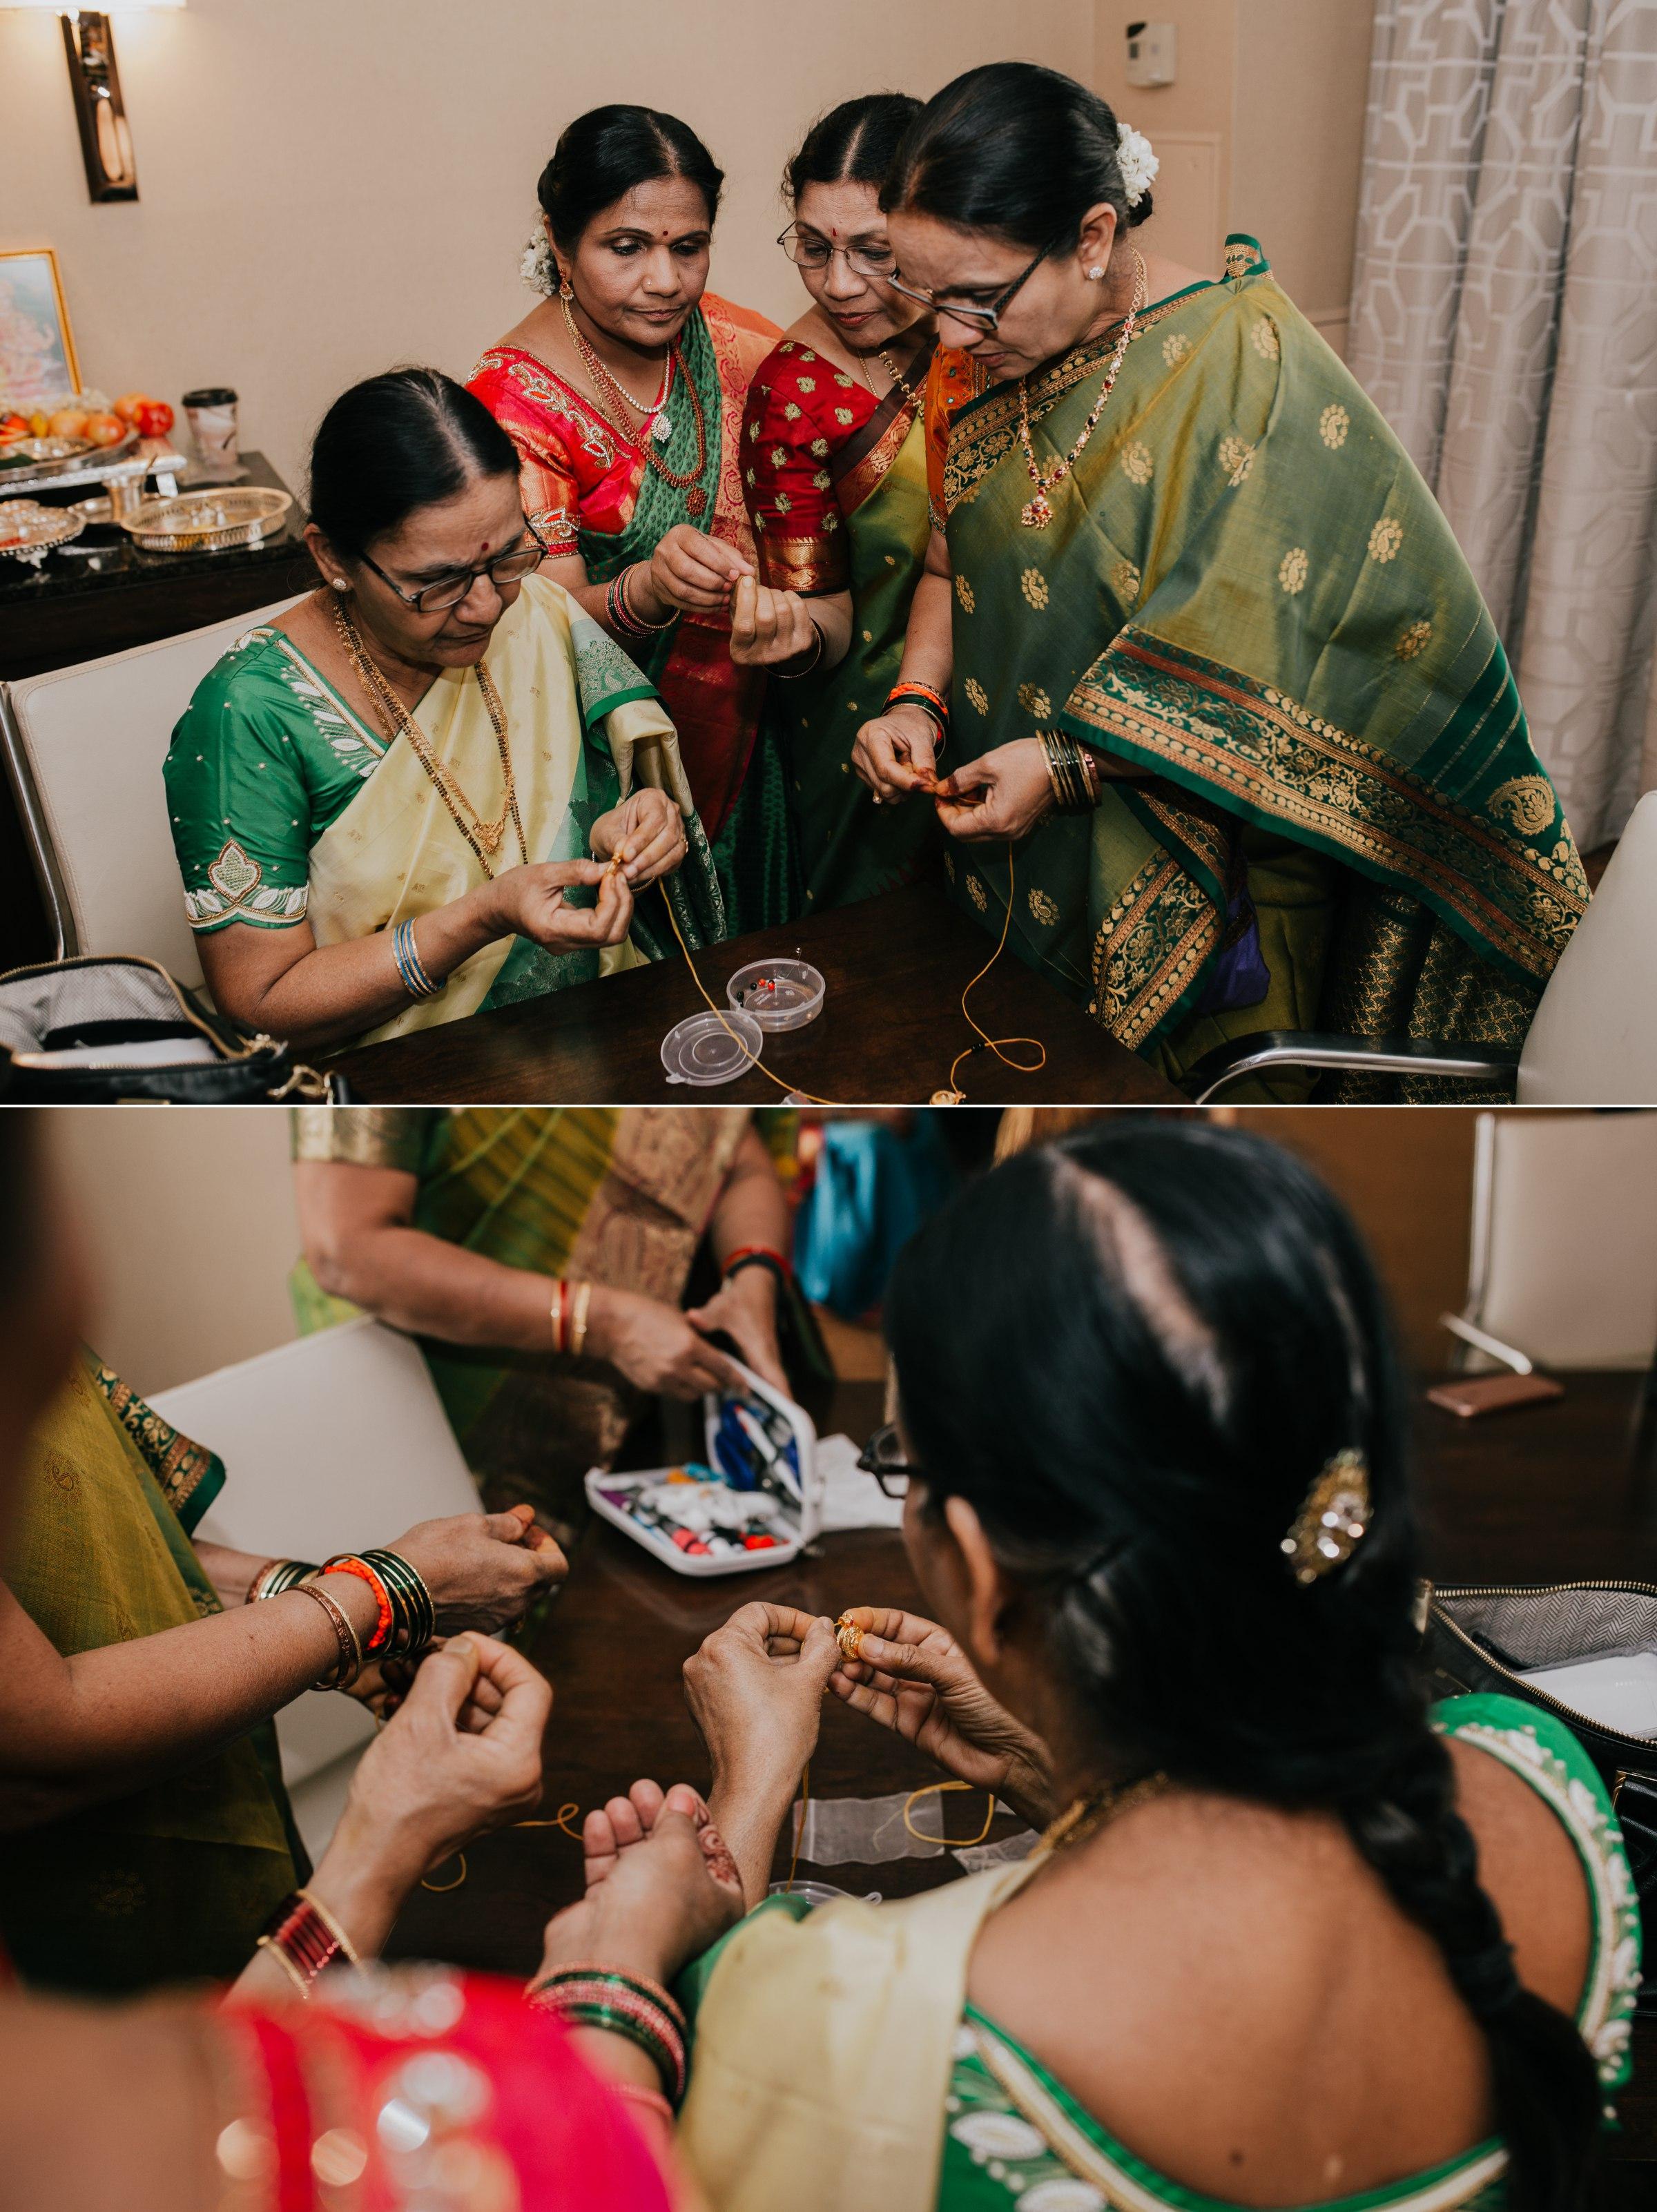 indian wedding spacesaver minneapolis minnesota texas austin wedding elopement destination intimate best photographer_0207.jpg